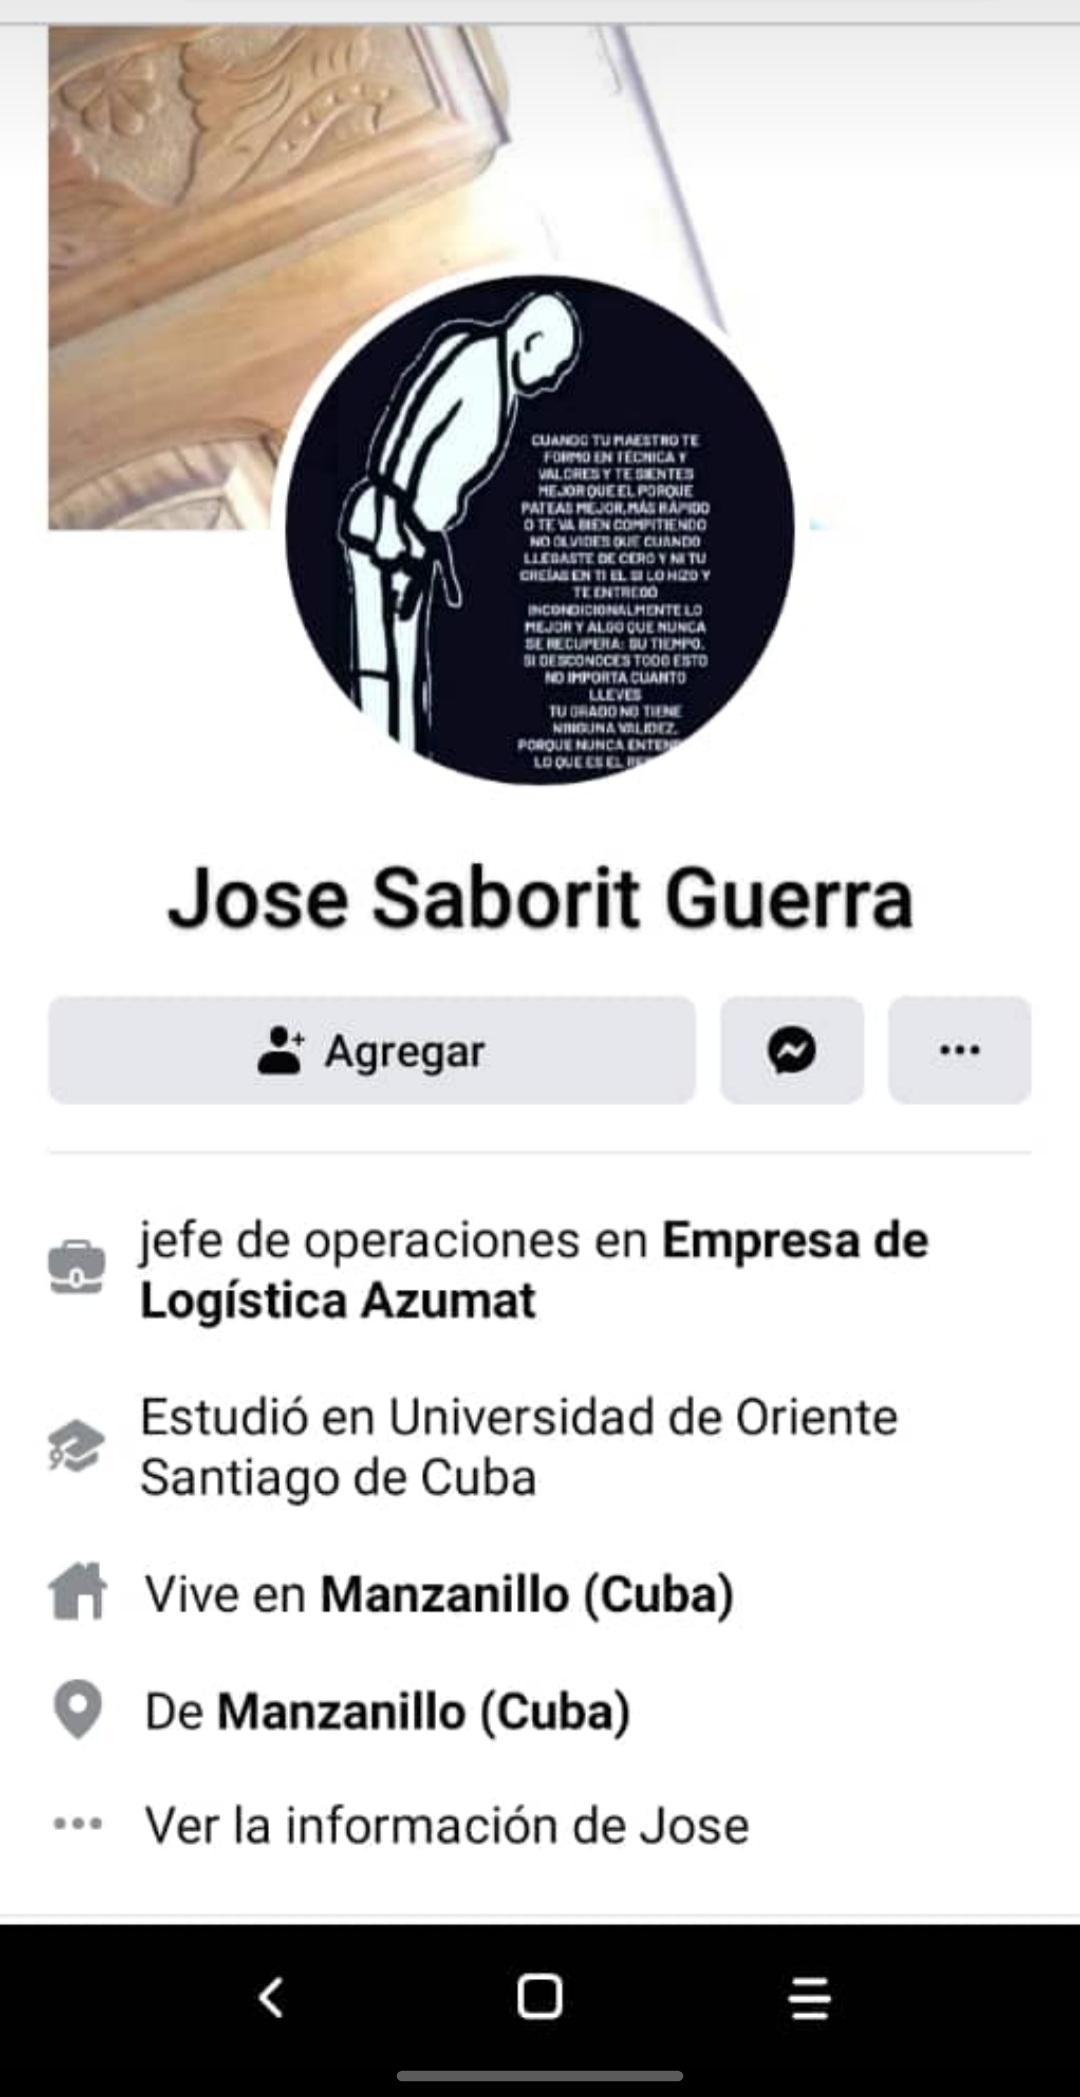 Jose saborit guerra